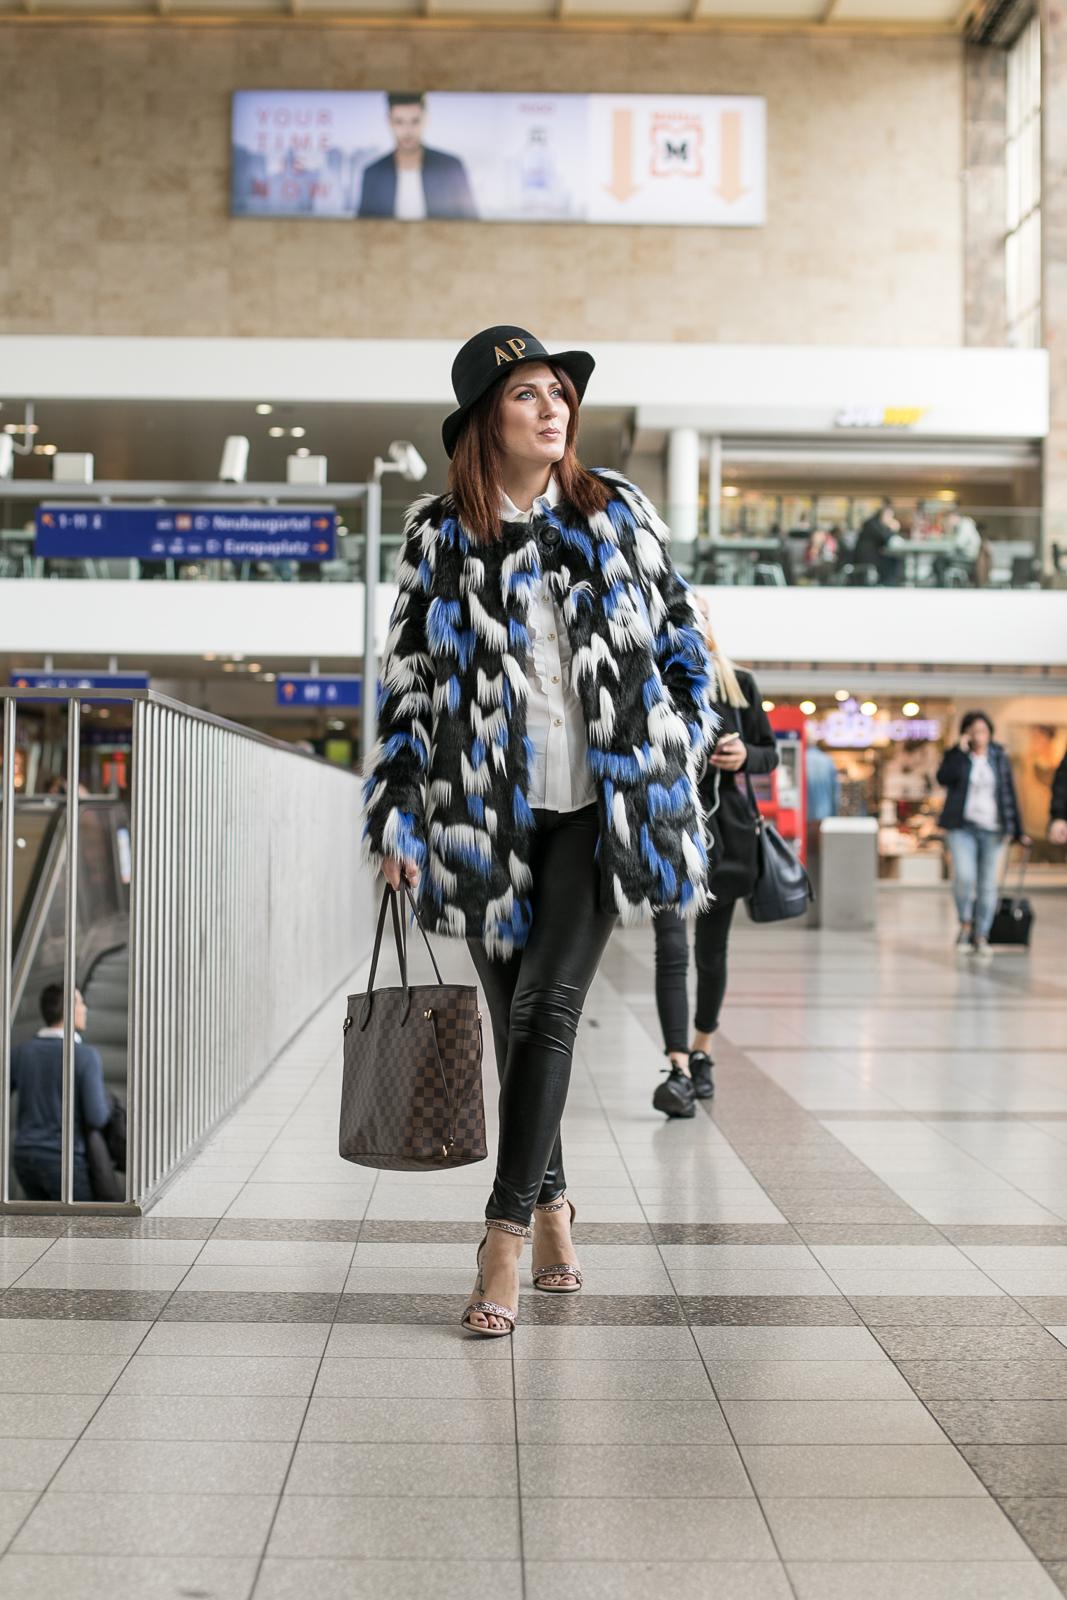 1600-shooting-nadja-nemetz-nadjanemetz-beauty-fashion-vienna-blogger-austrianblogger-violet-fleur-violetfleur-beautyblogger-fashionblogger-hse24-021